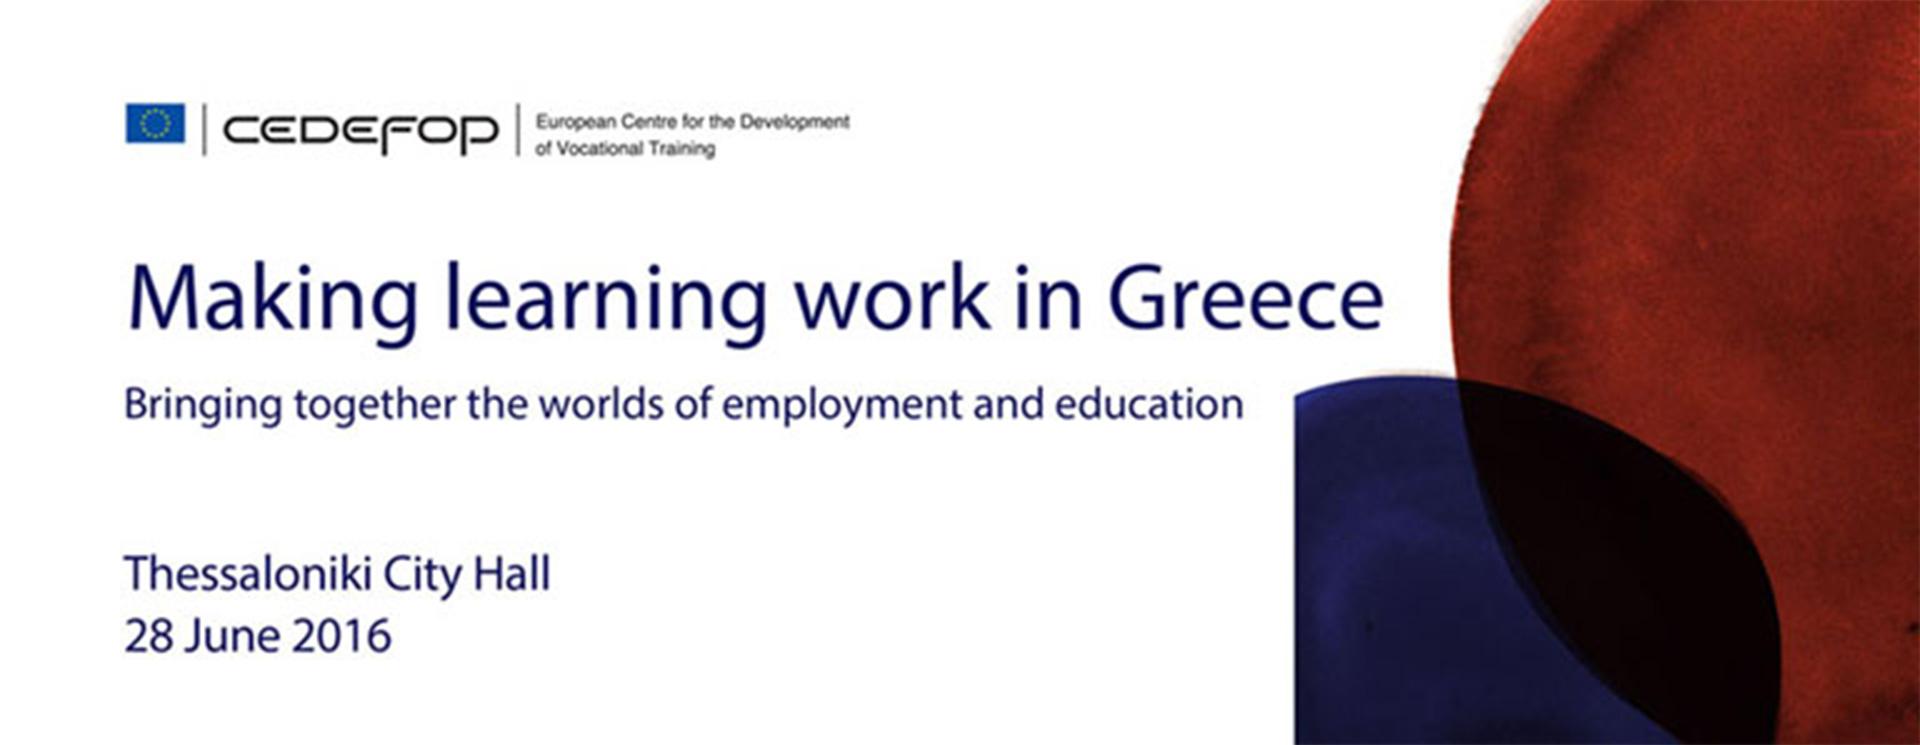 MAKING LEARNING WORK IN GREECE SEMINAR